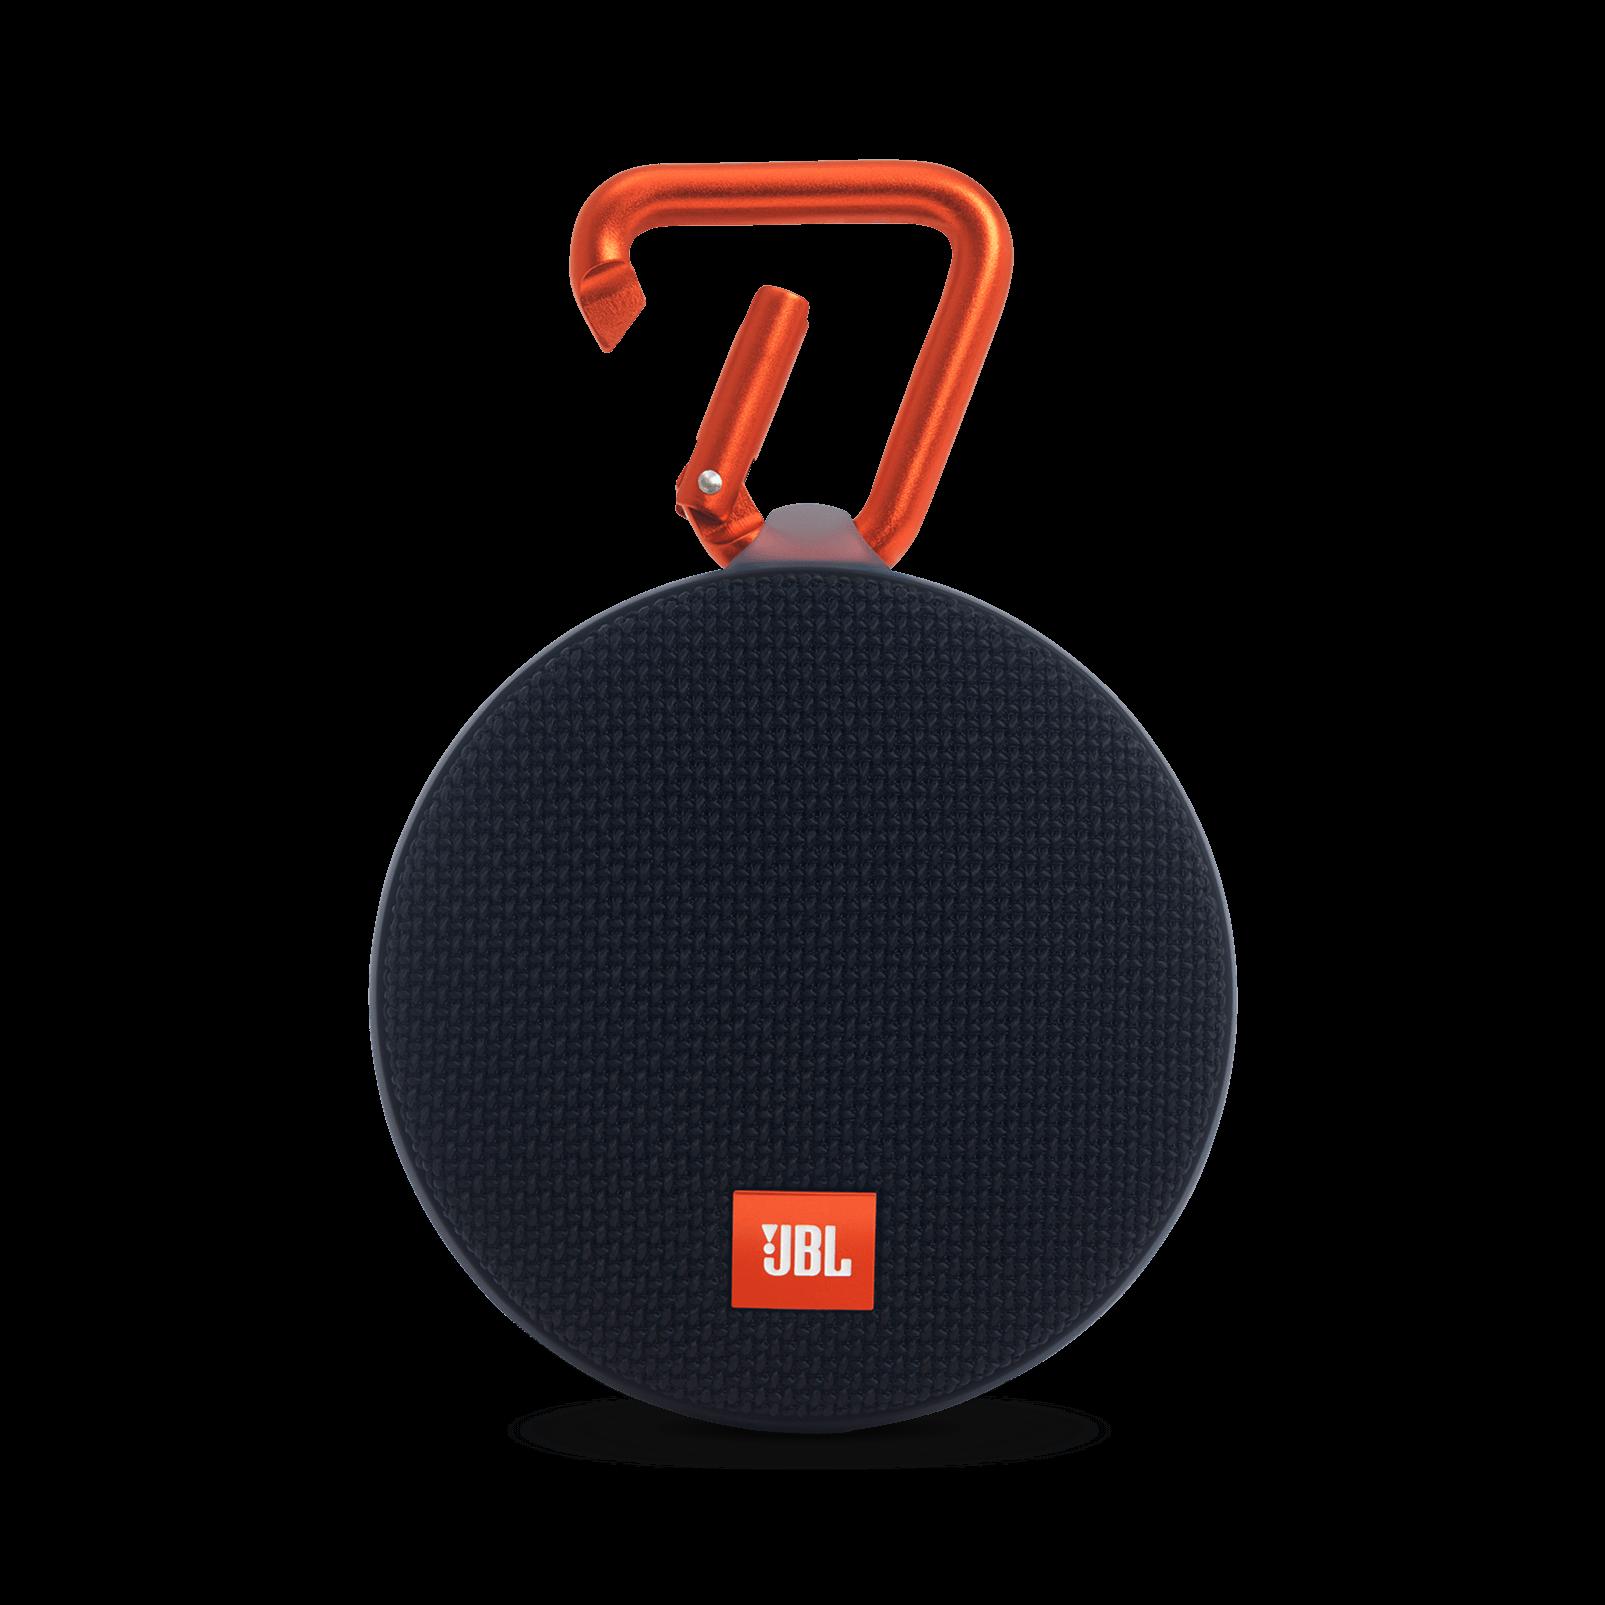 jbl-bluetooth-speakers-6